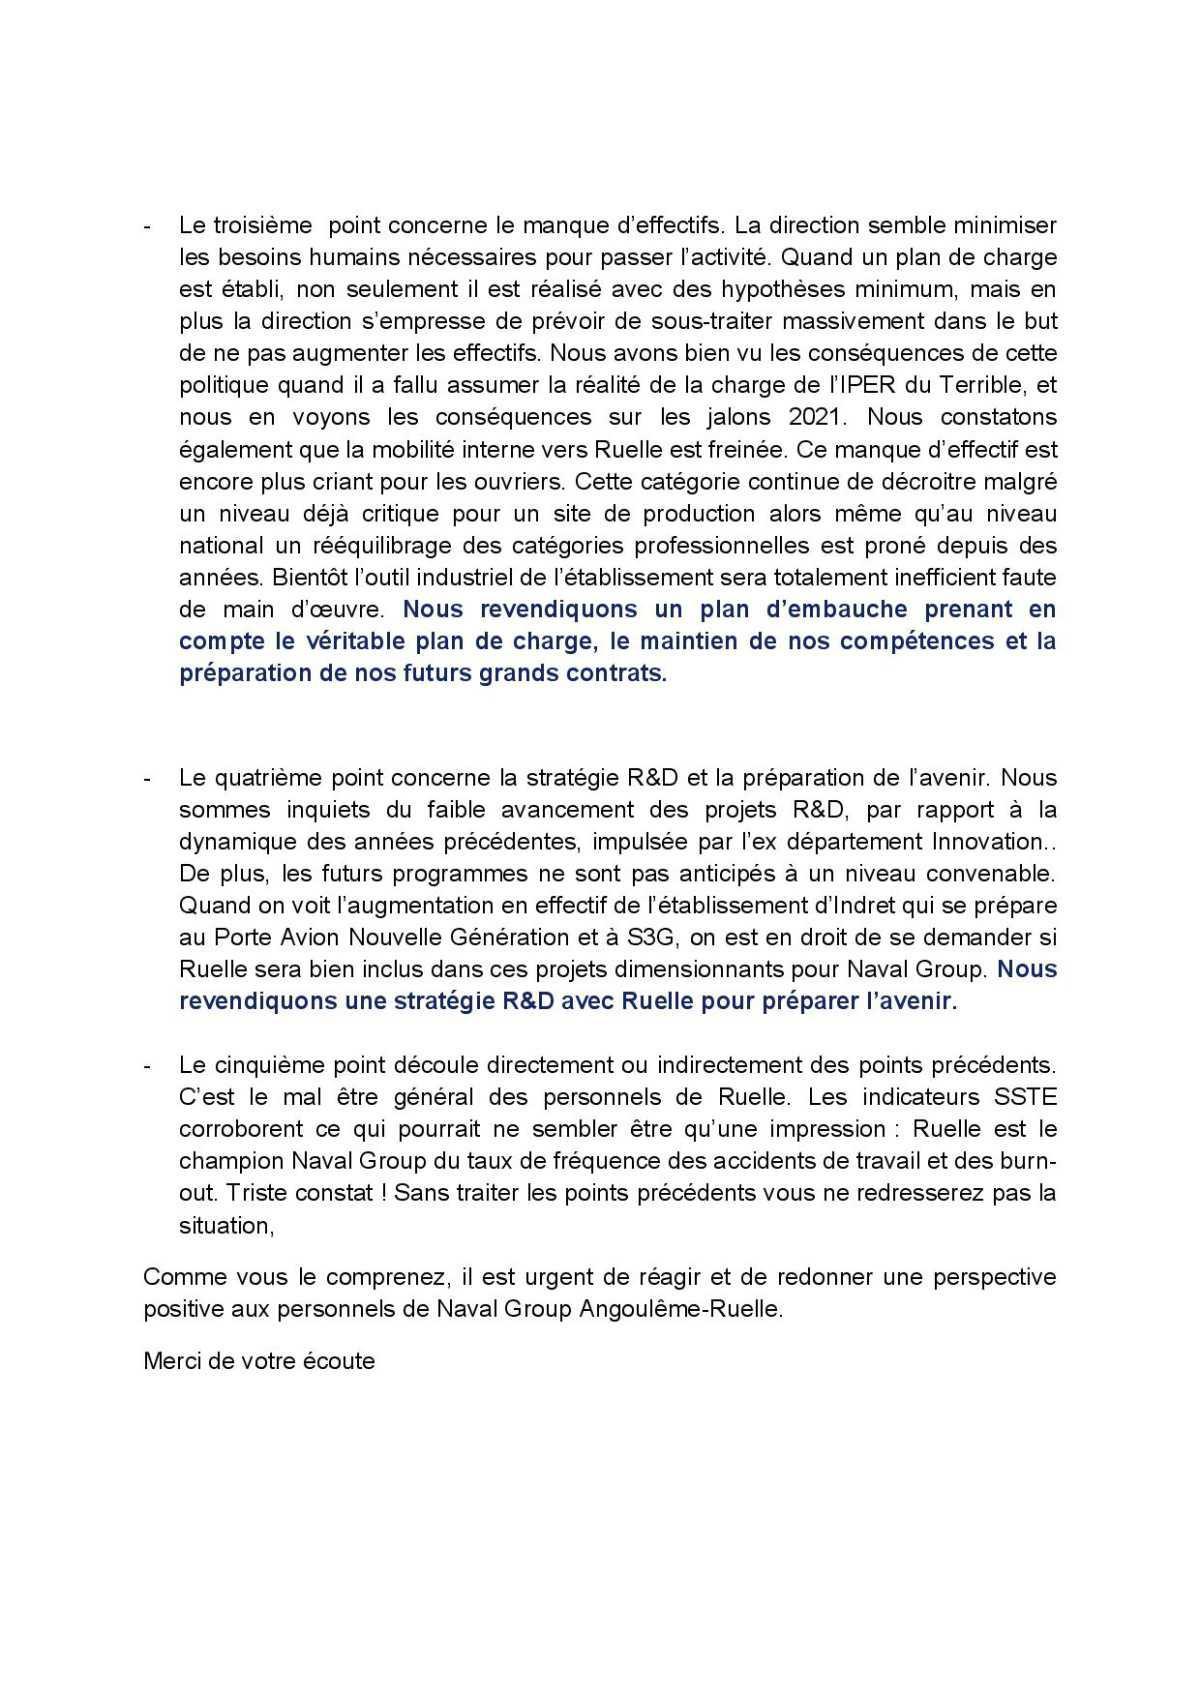 Visite de Laurent Espinasse - 1er septembre 2021